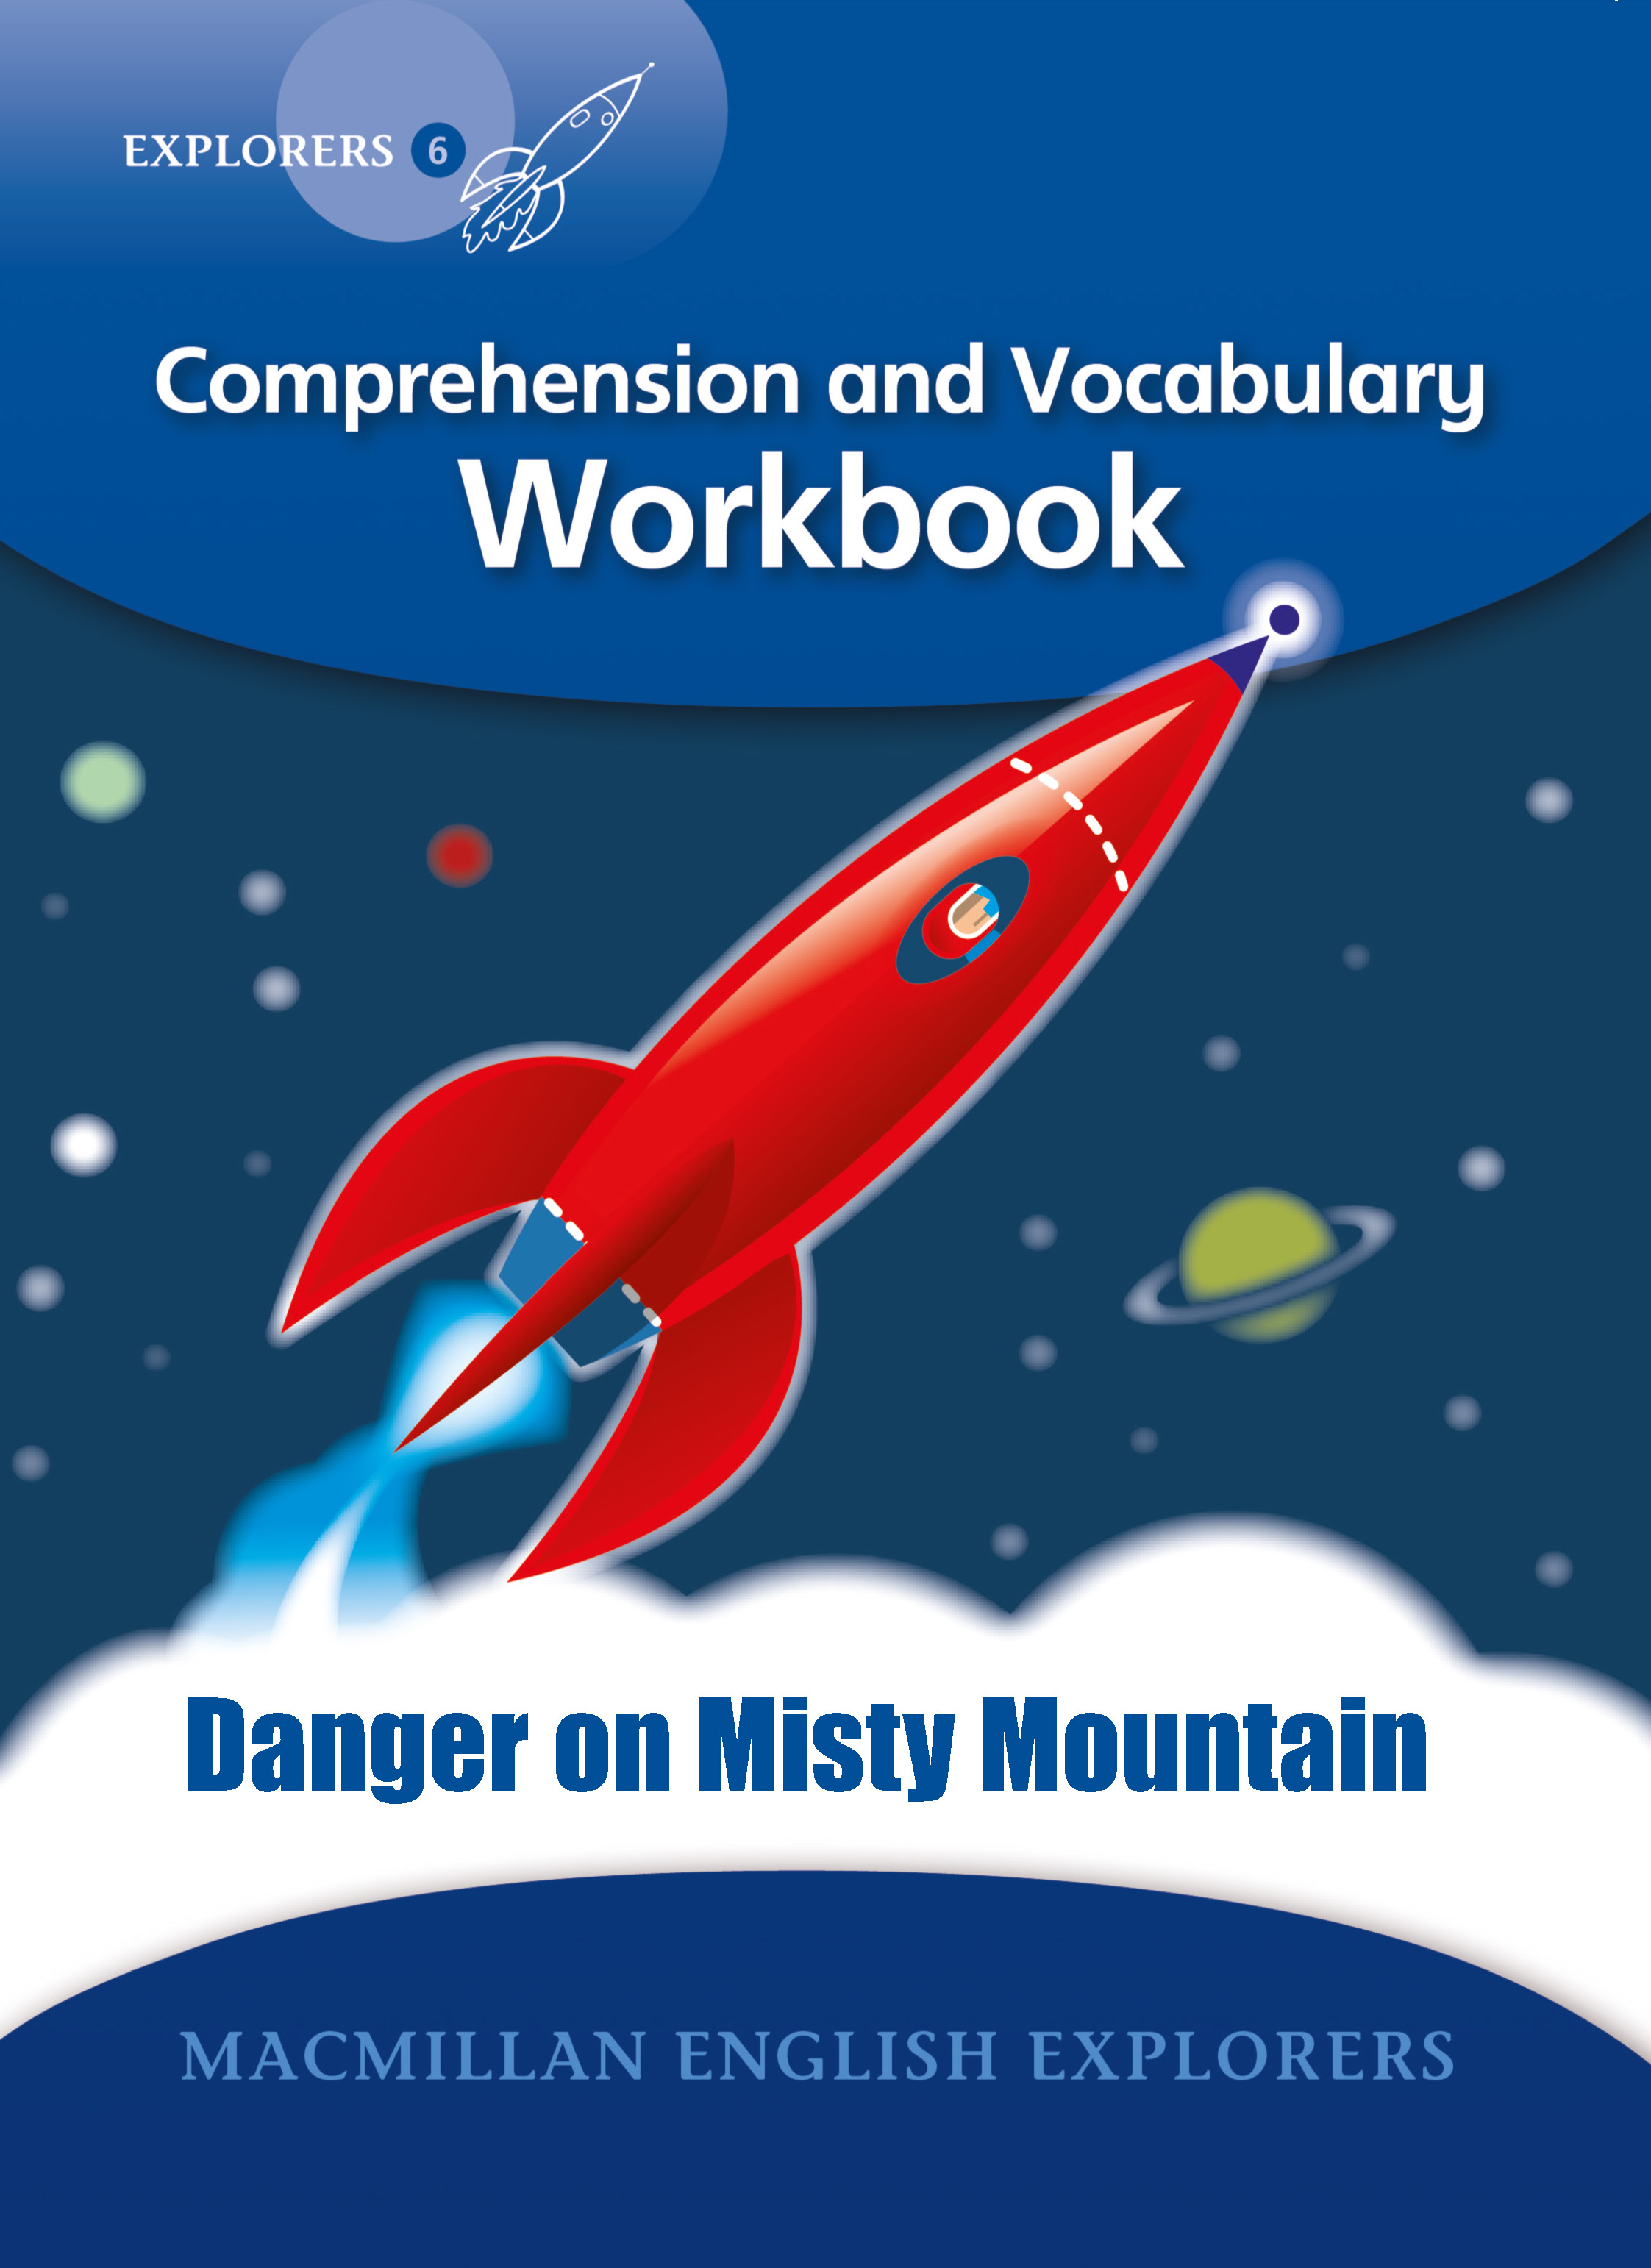 Explorers 6: Danger on Misty Mountain Workbook